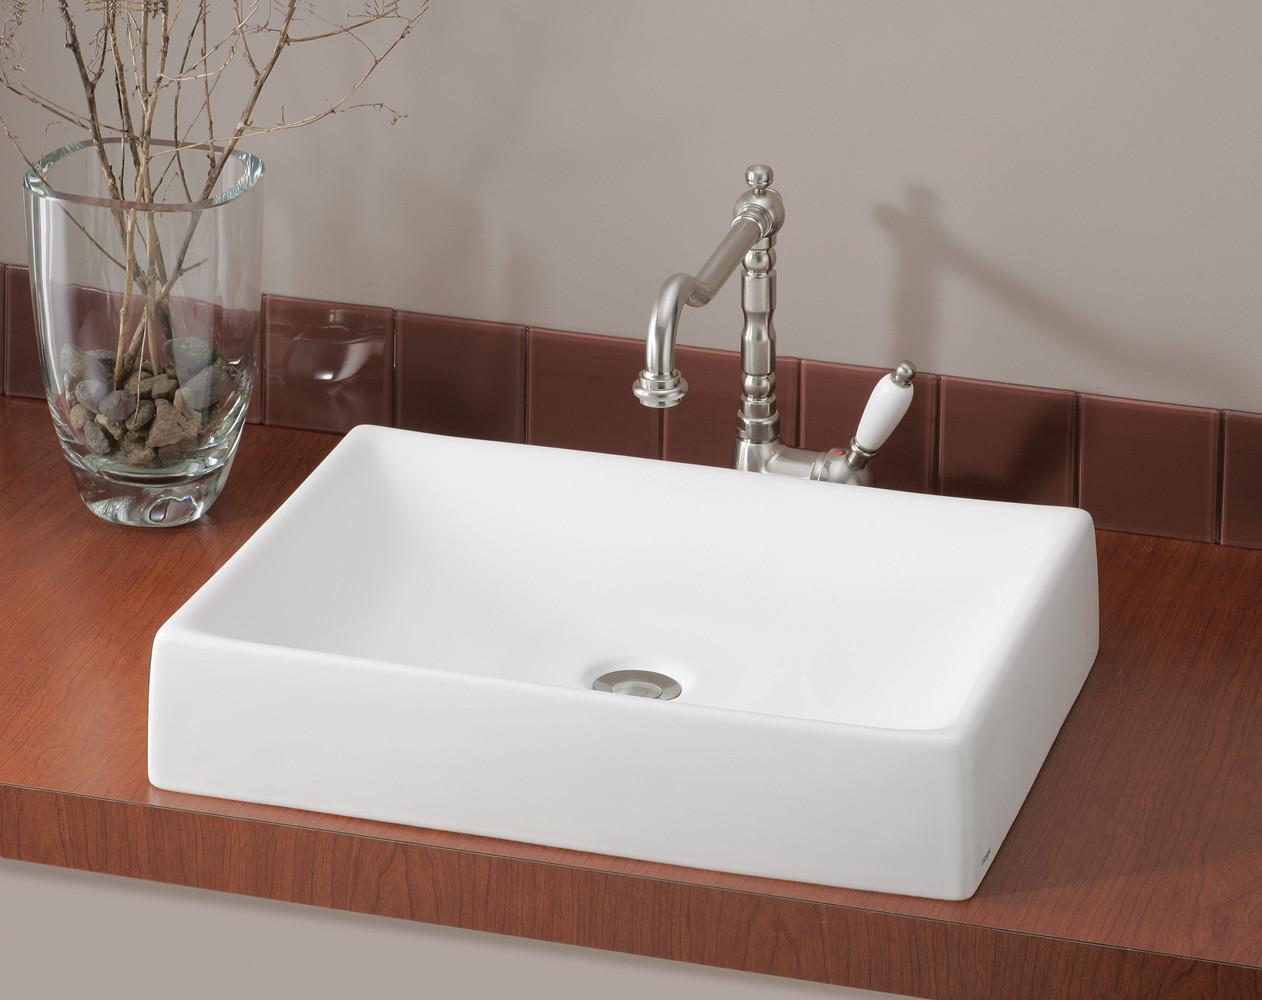 Cheviot 1246 QUATTRO Rectangular Single Bowl Bathroom Vessel Sink